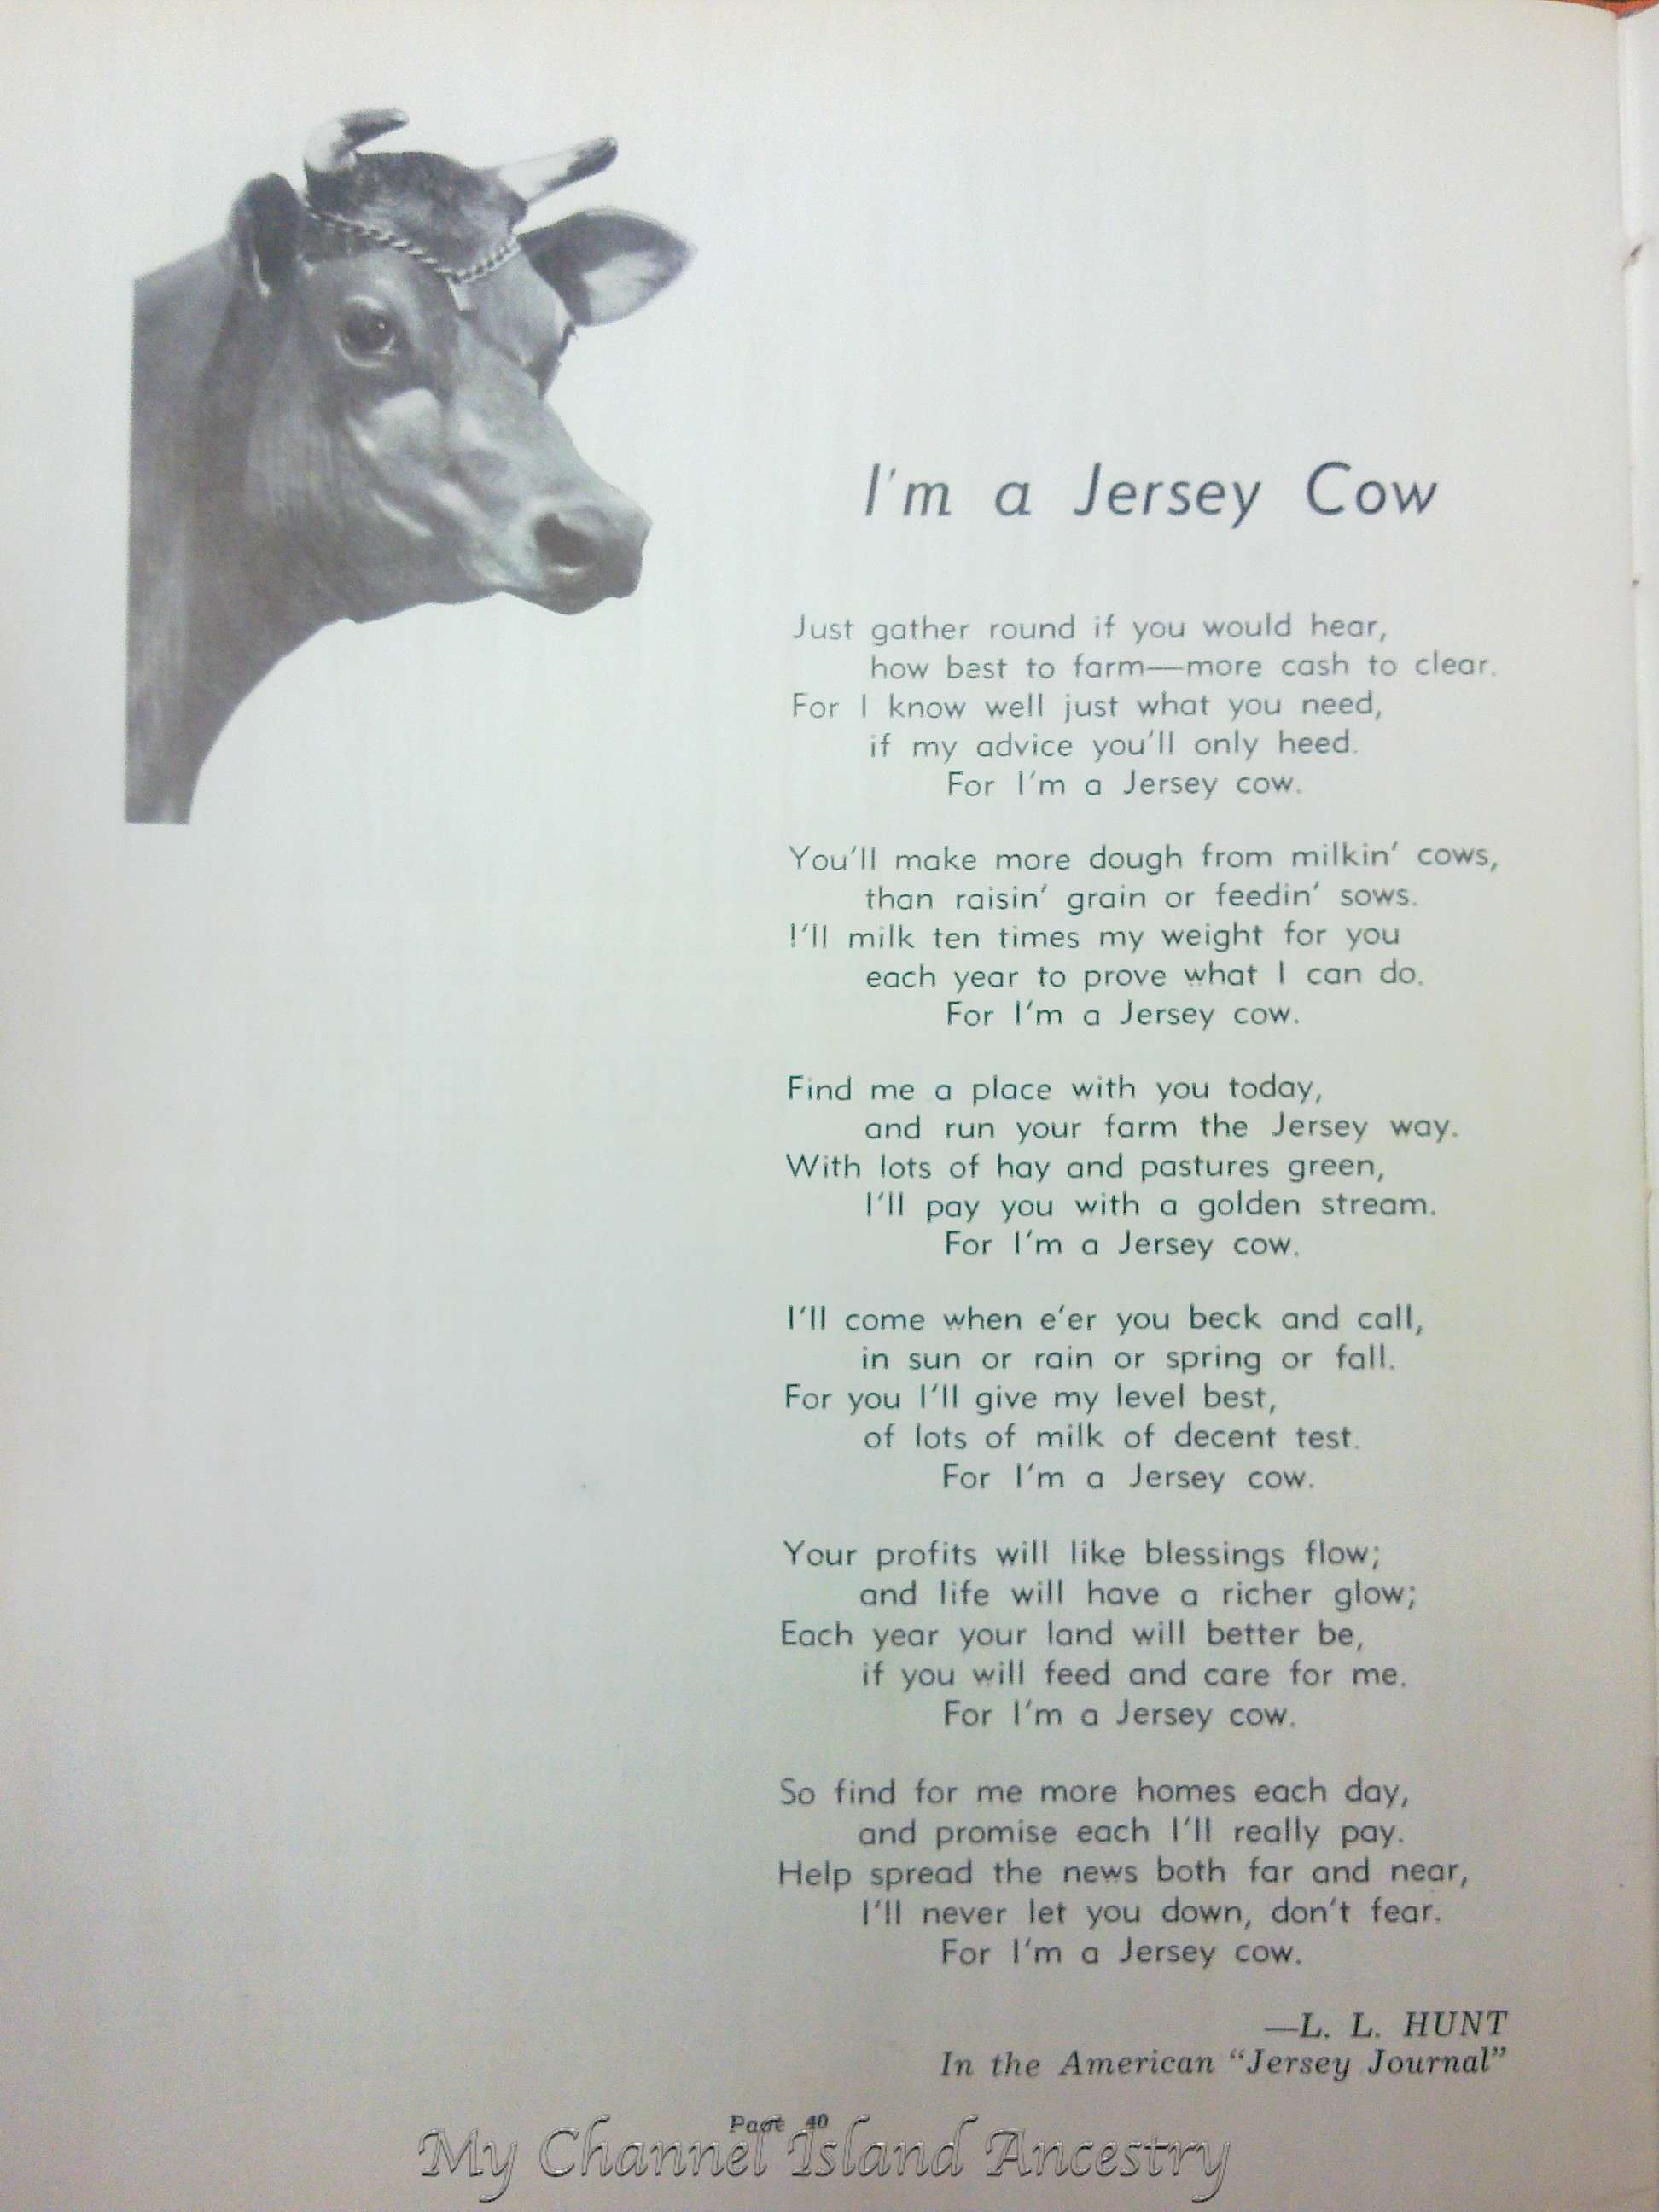 Uncategorized Cow Poems jersey cow my channel island ancestry advertisements